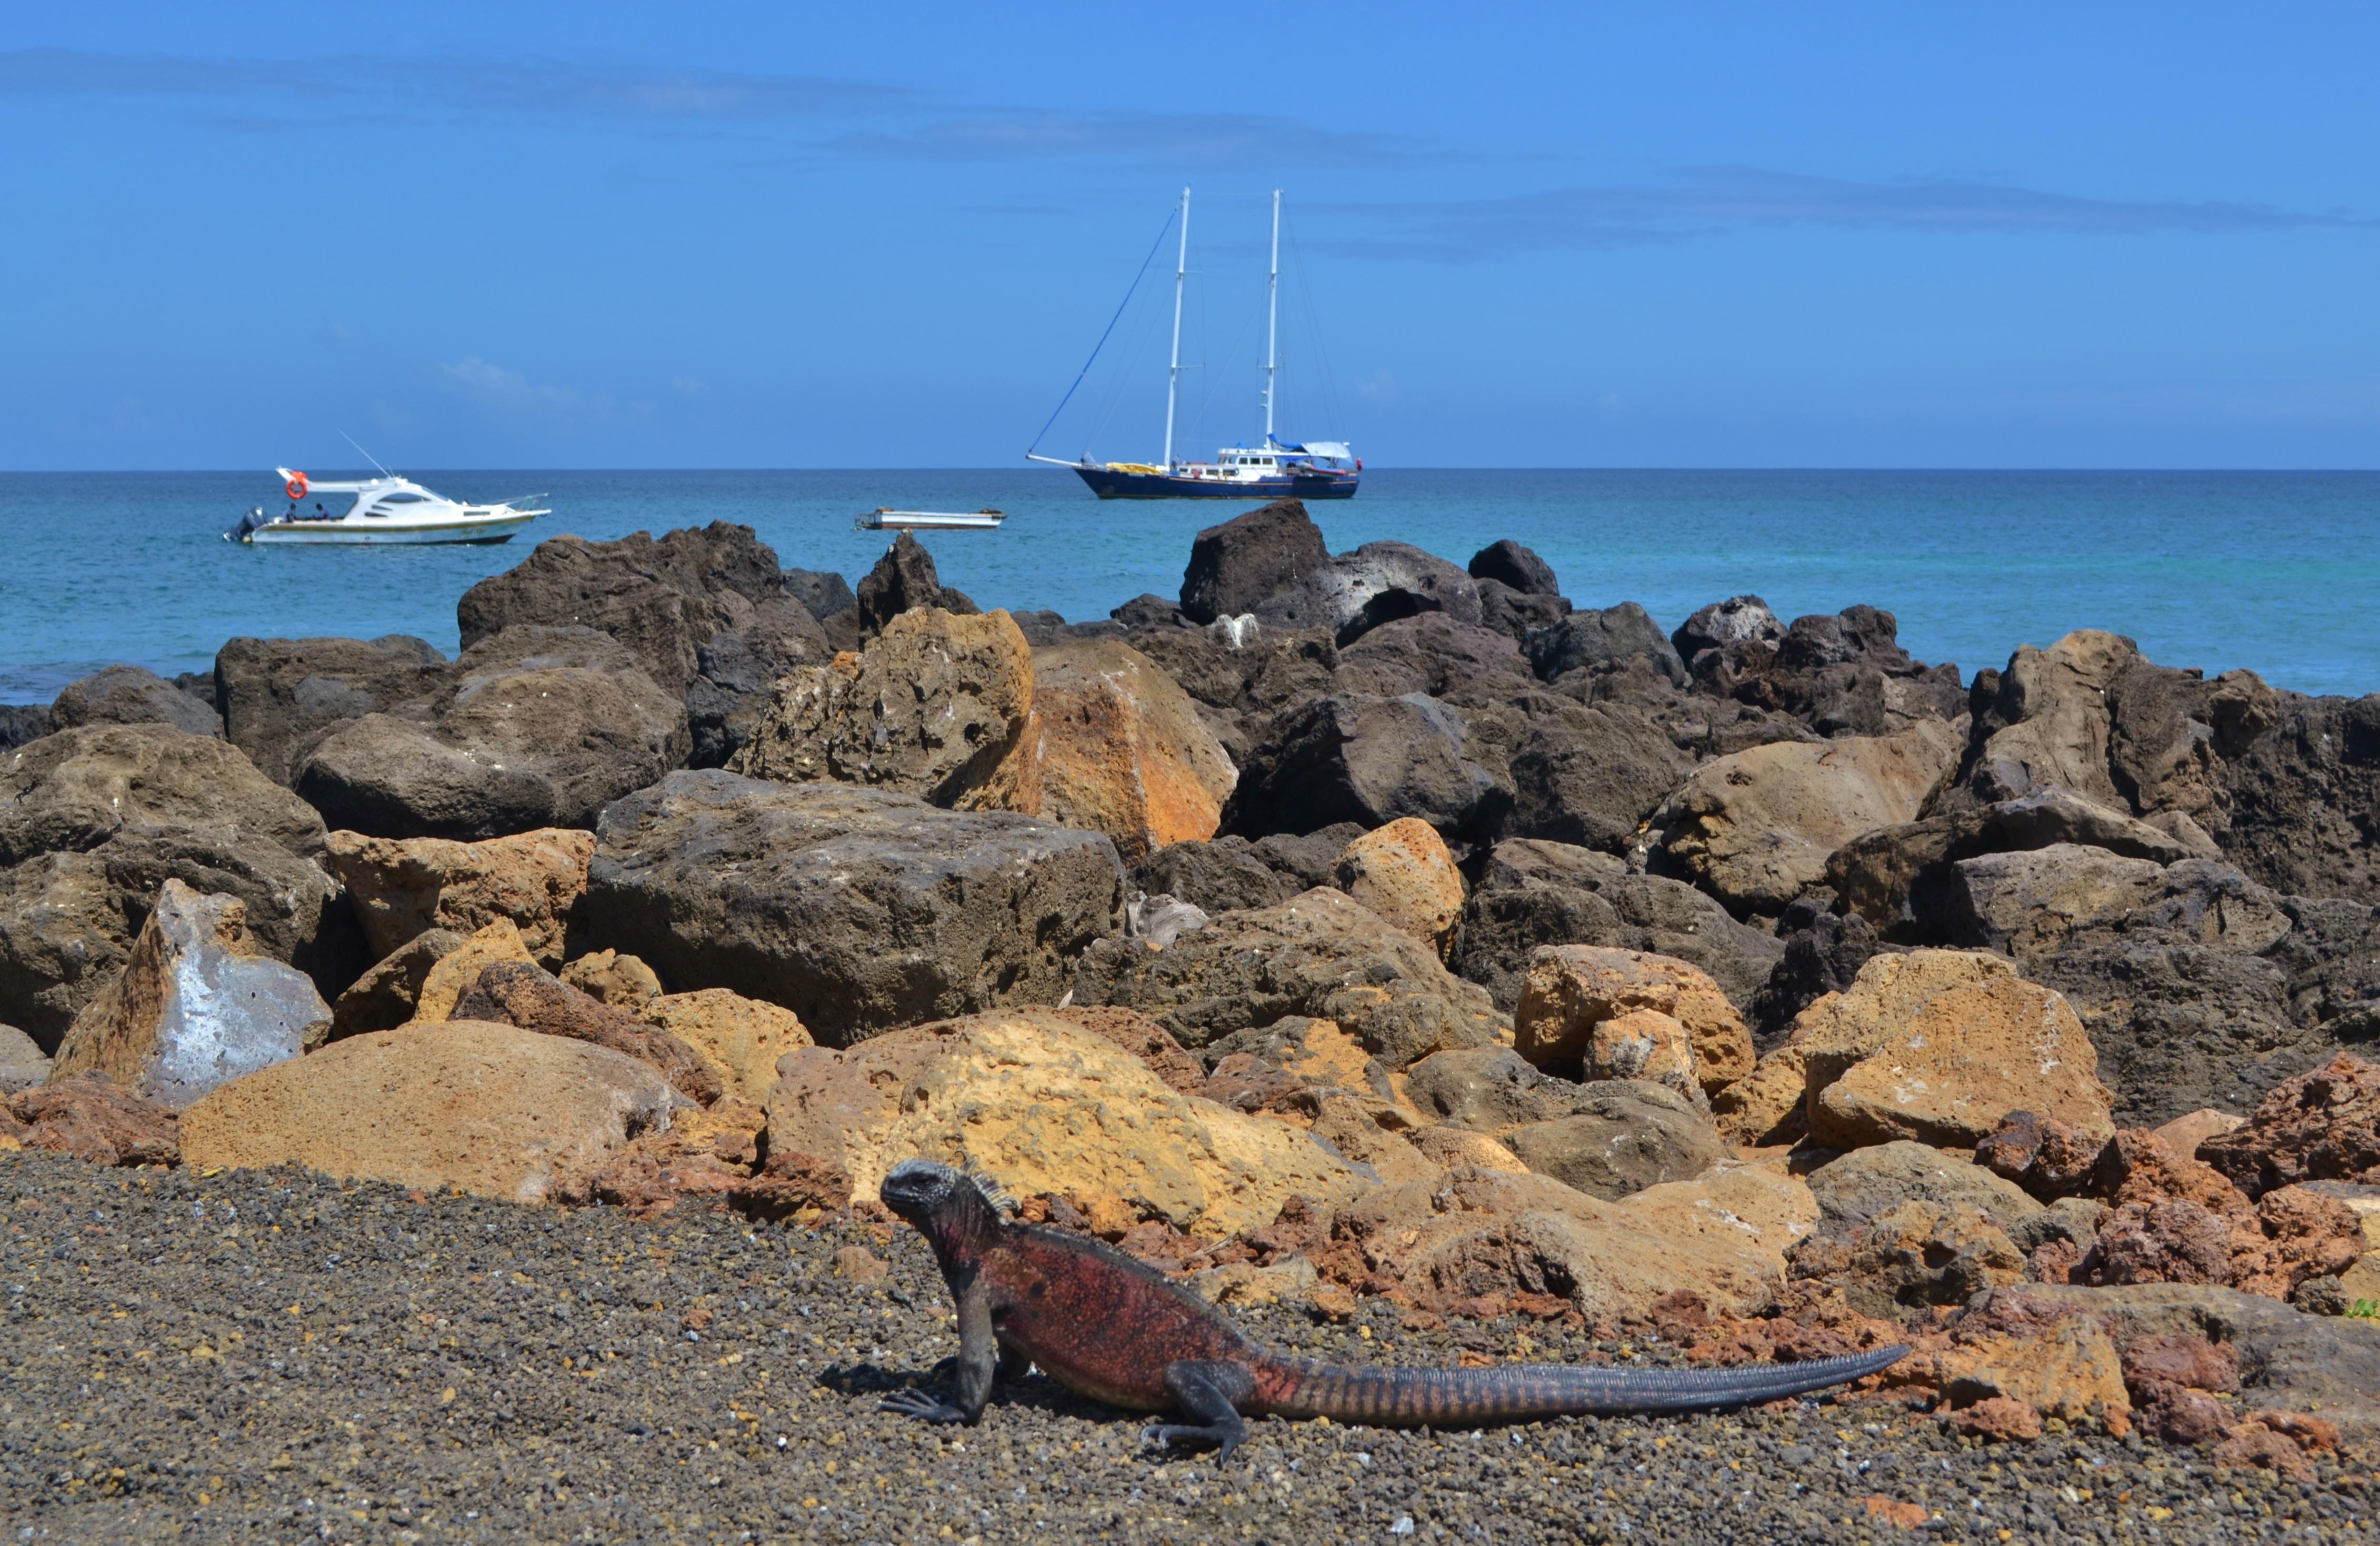 Islas de Galapagos sea iguana